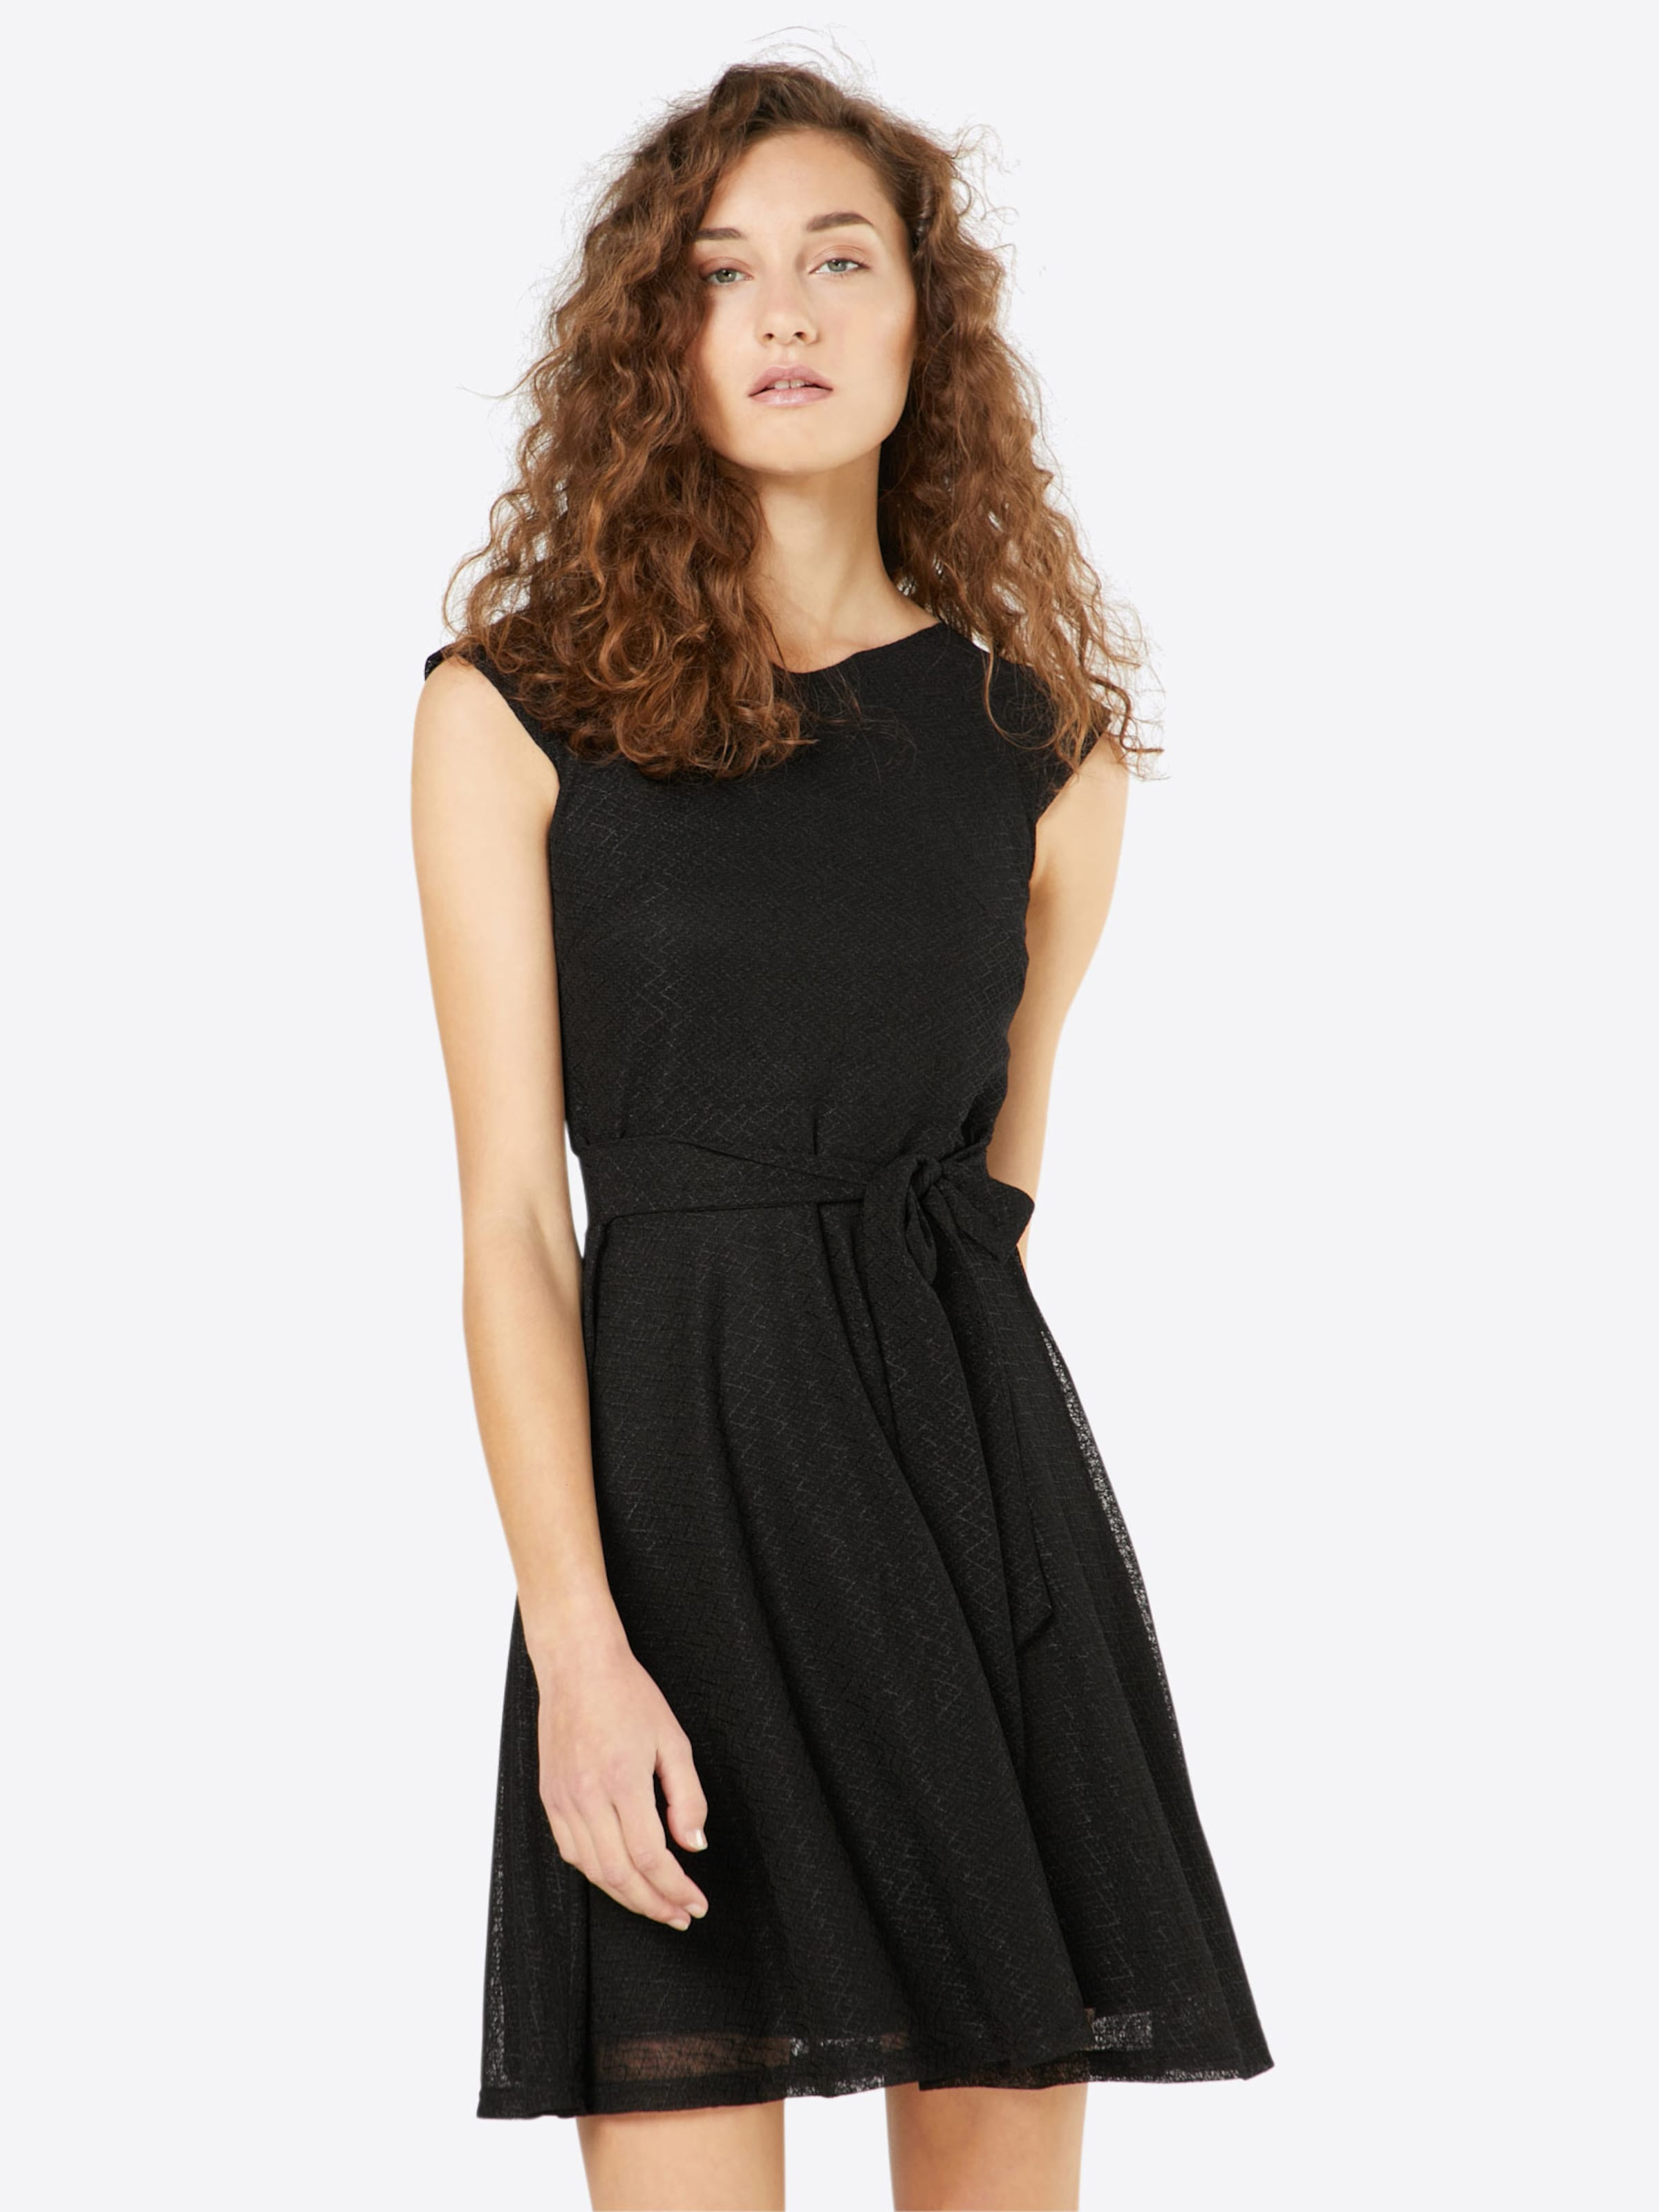 Mela London Kleid 'TEXTURED CAPPED' Verkauf Online-Shop IVcF9ZVkL1